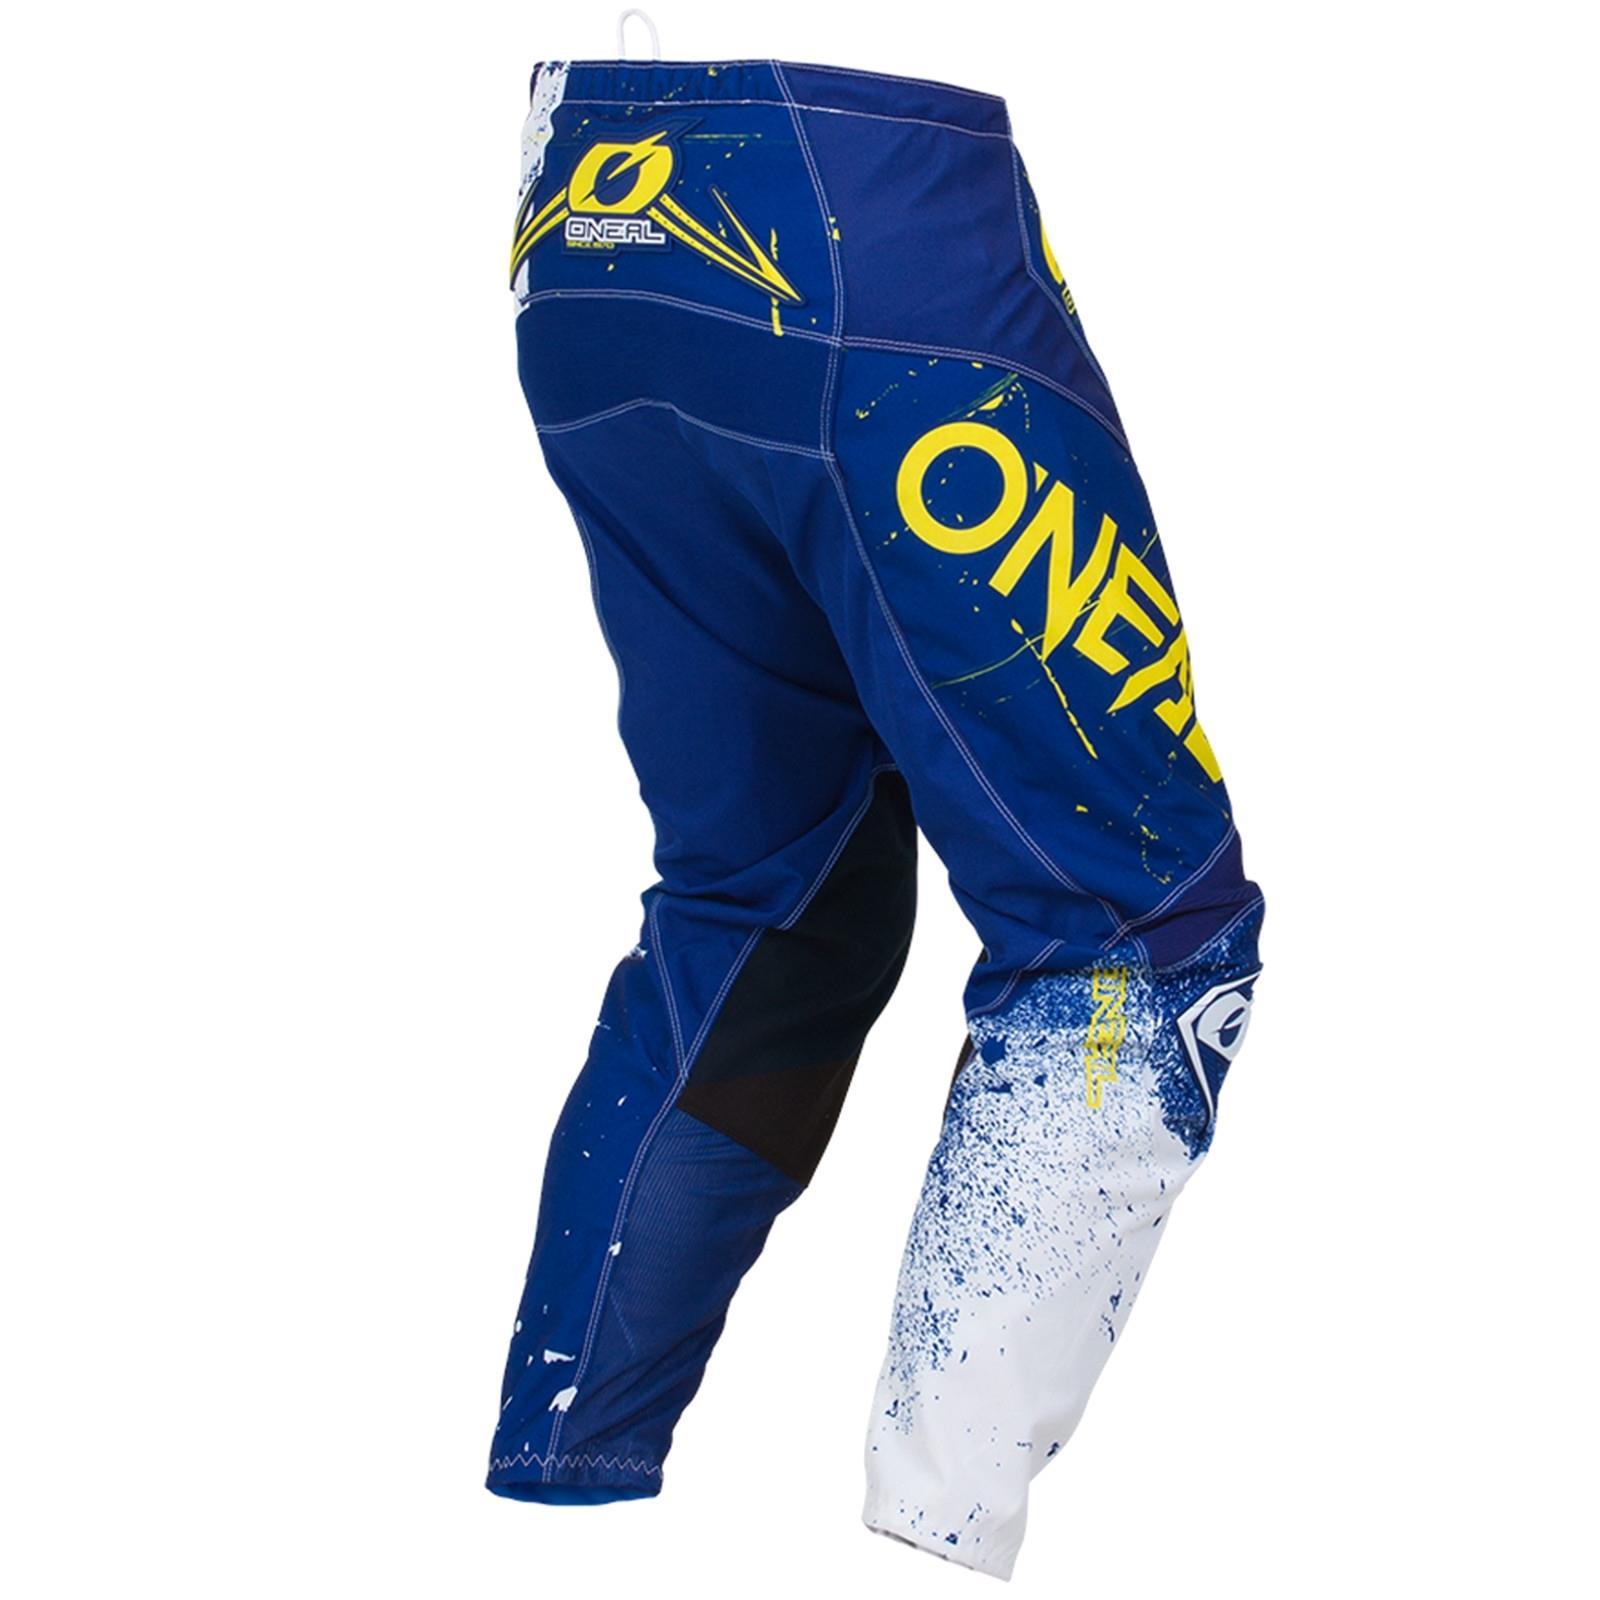 ONeal-pantalones-de-Jersey-de-los-ninos-de-pantalones-cortos-ninos-MX-bicicleta-DH-montana-bicicleta miniatura 111